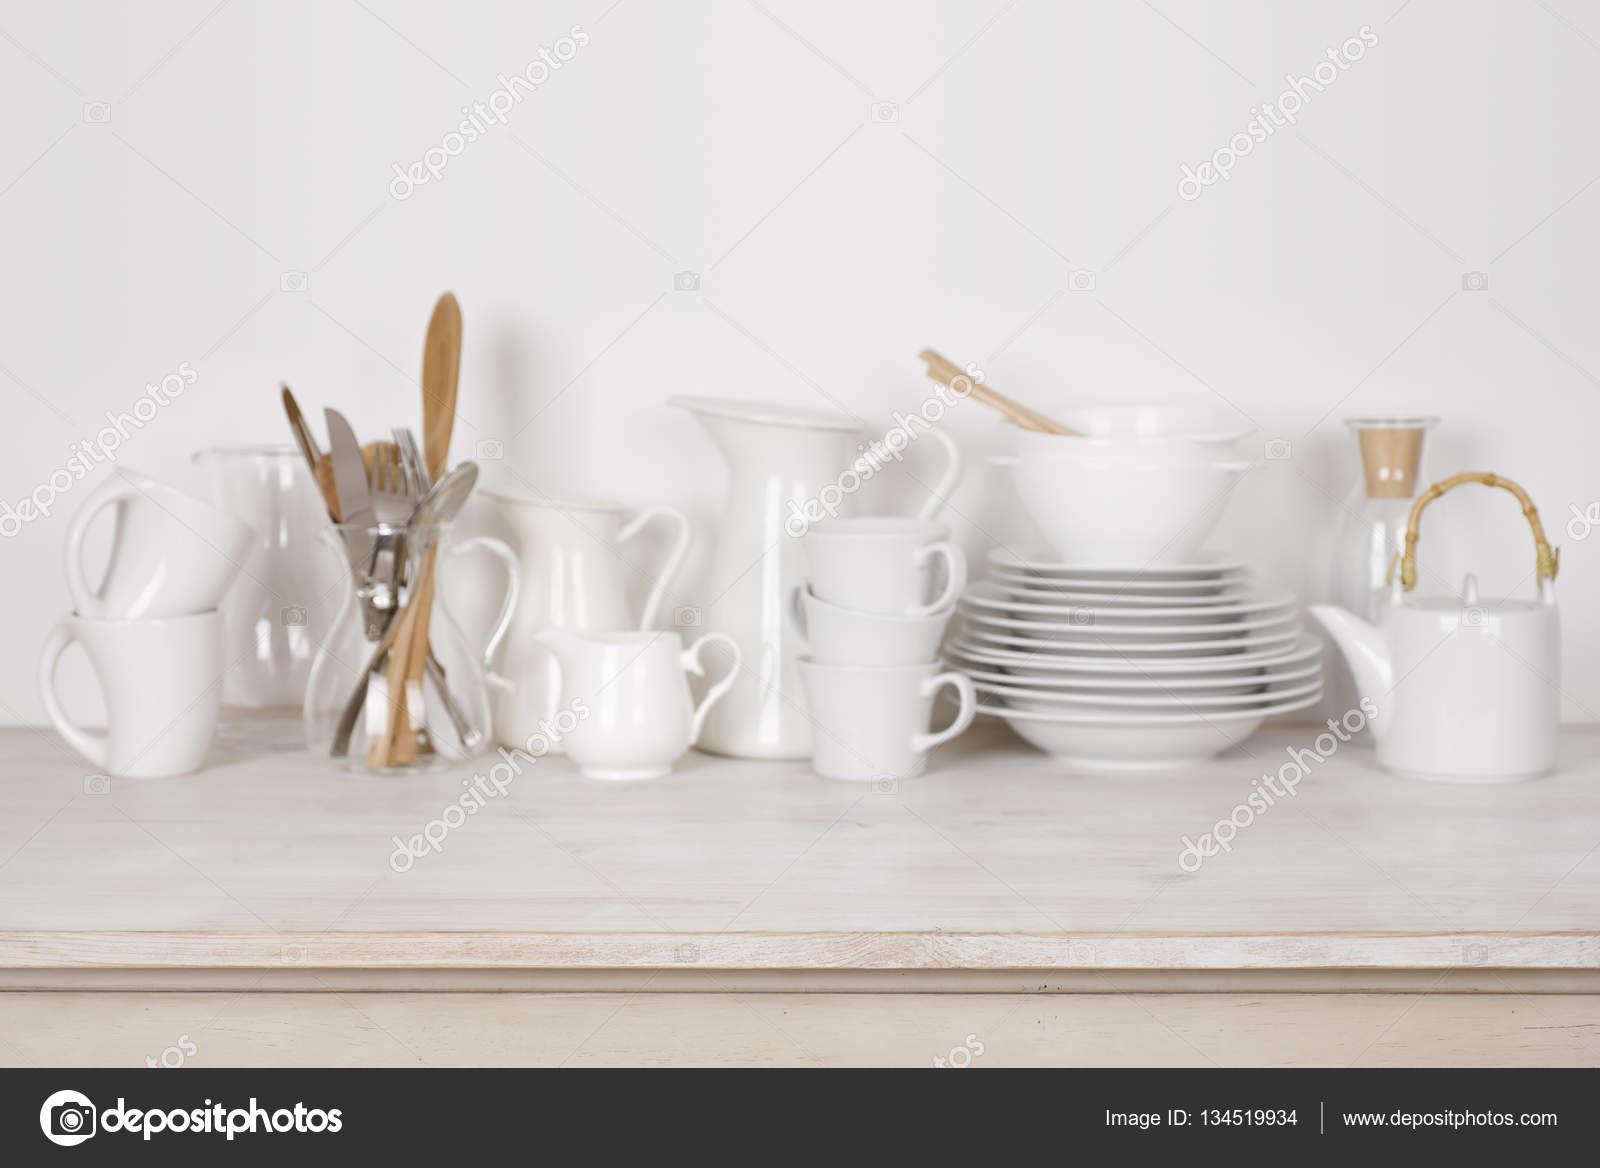 kitchen cutlery small furniture 模糊的木桌和副本空间厨房餐具背景 图库照片 c didecs 134519934